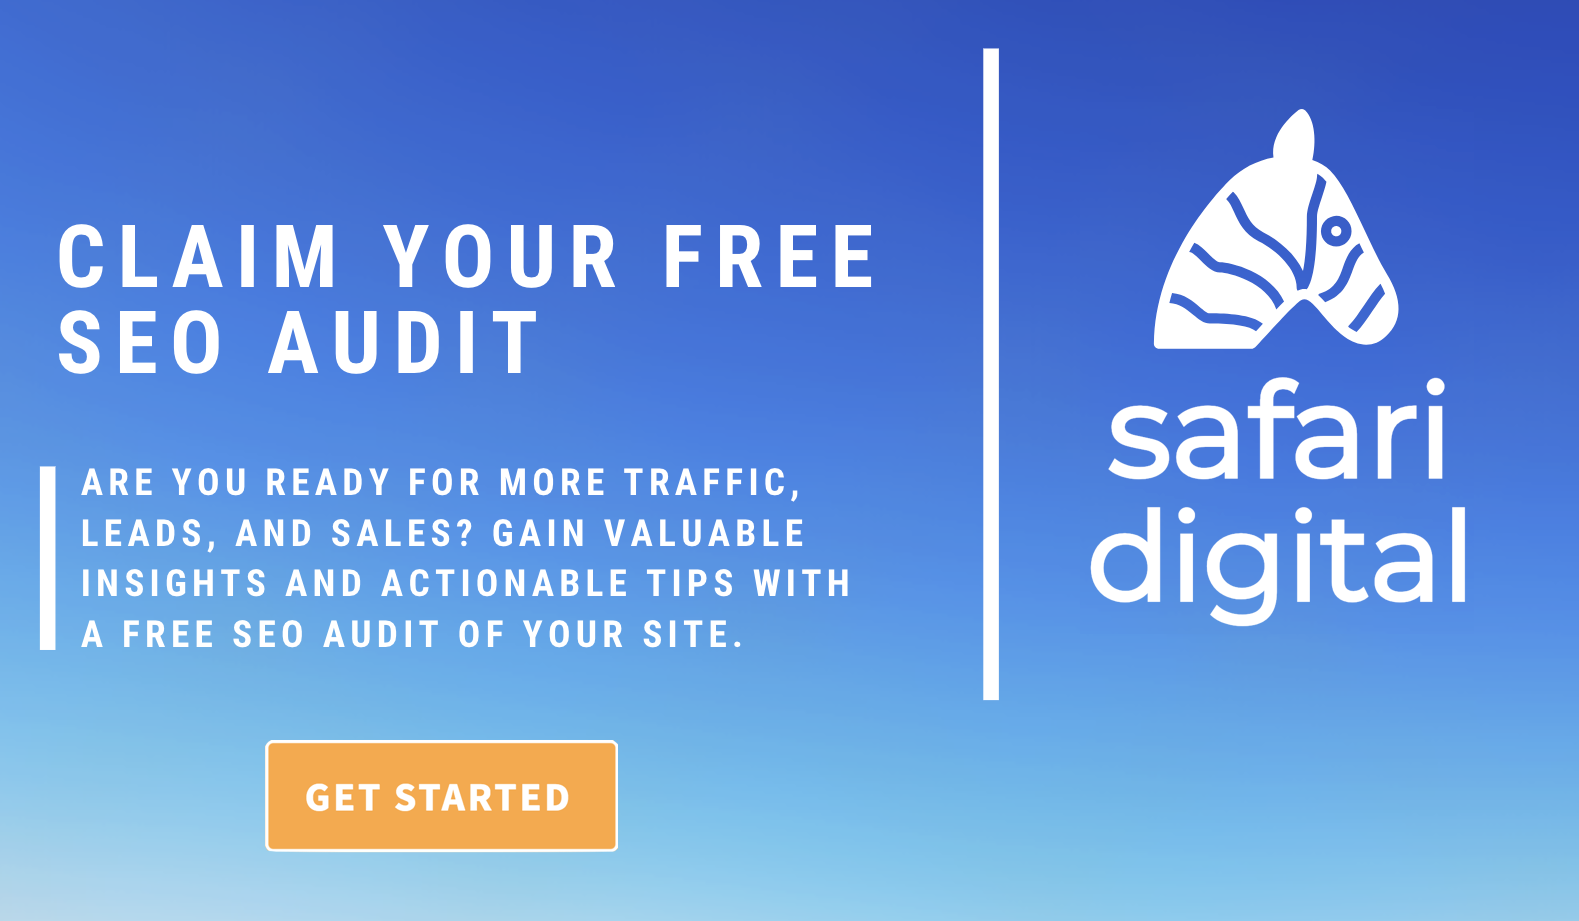 Free SEO audit offer